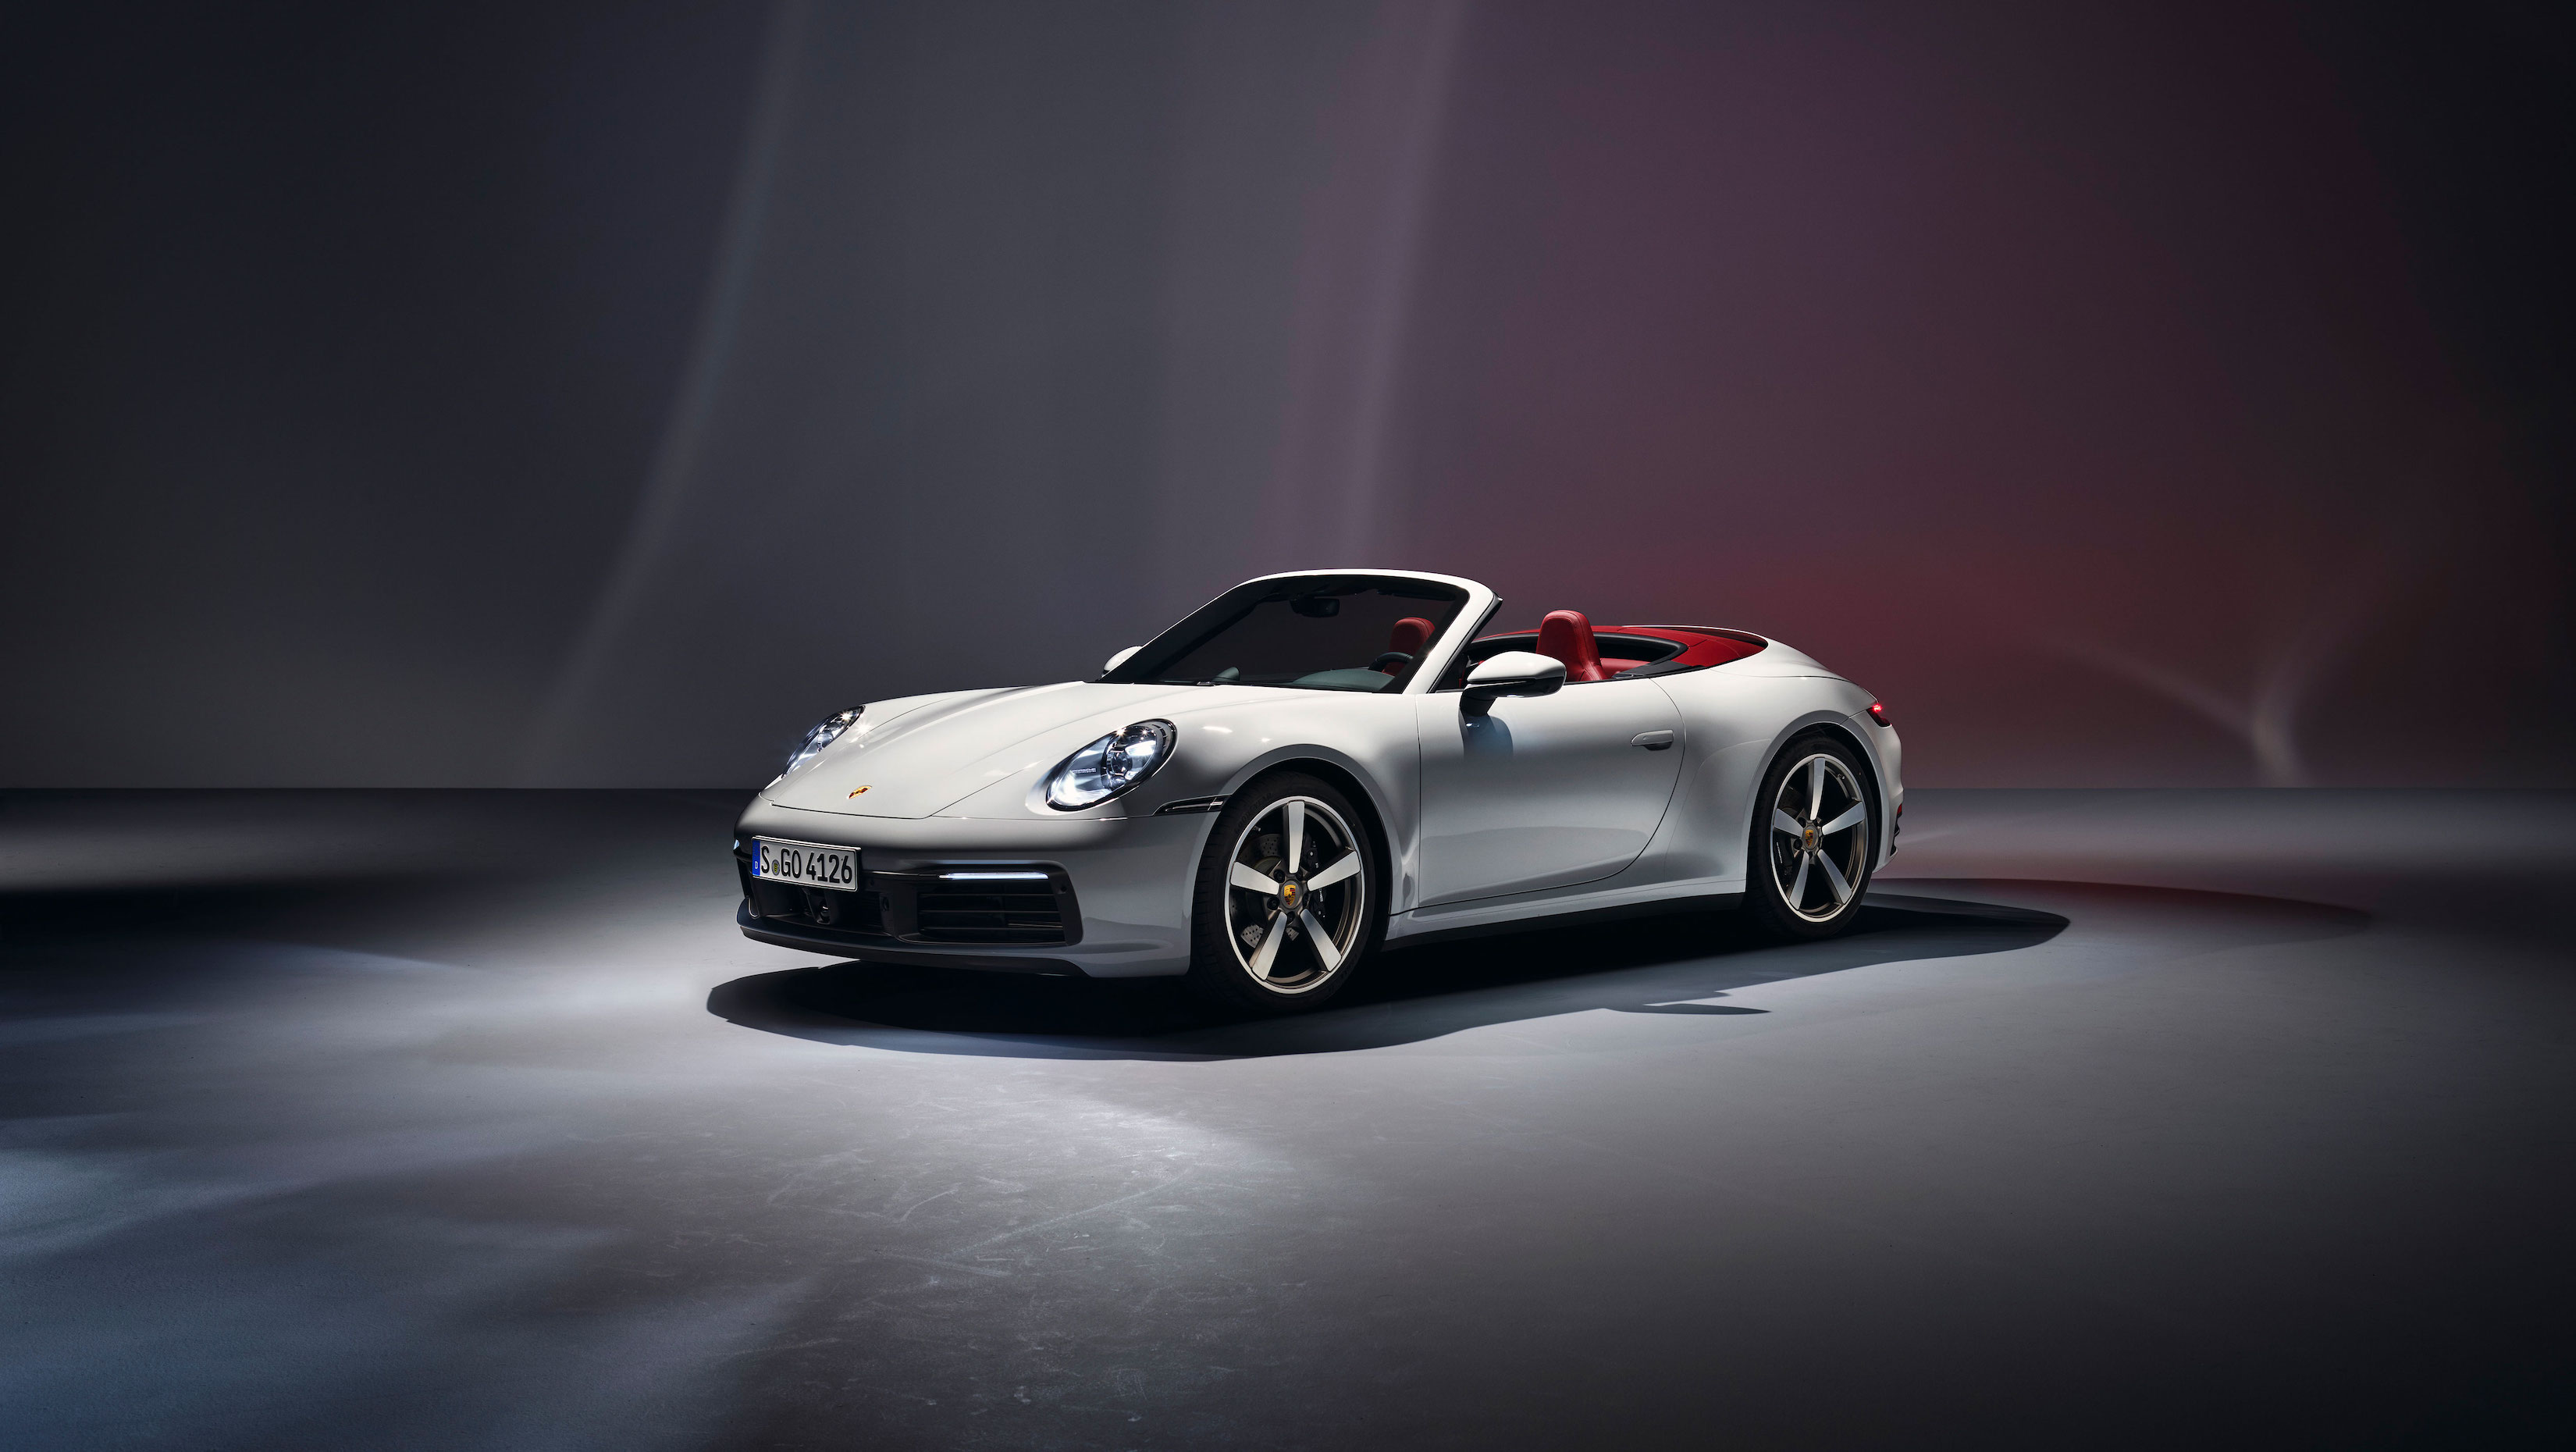 Porsche 911 Carrera front 3/4